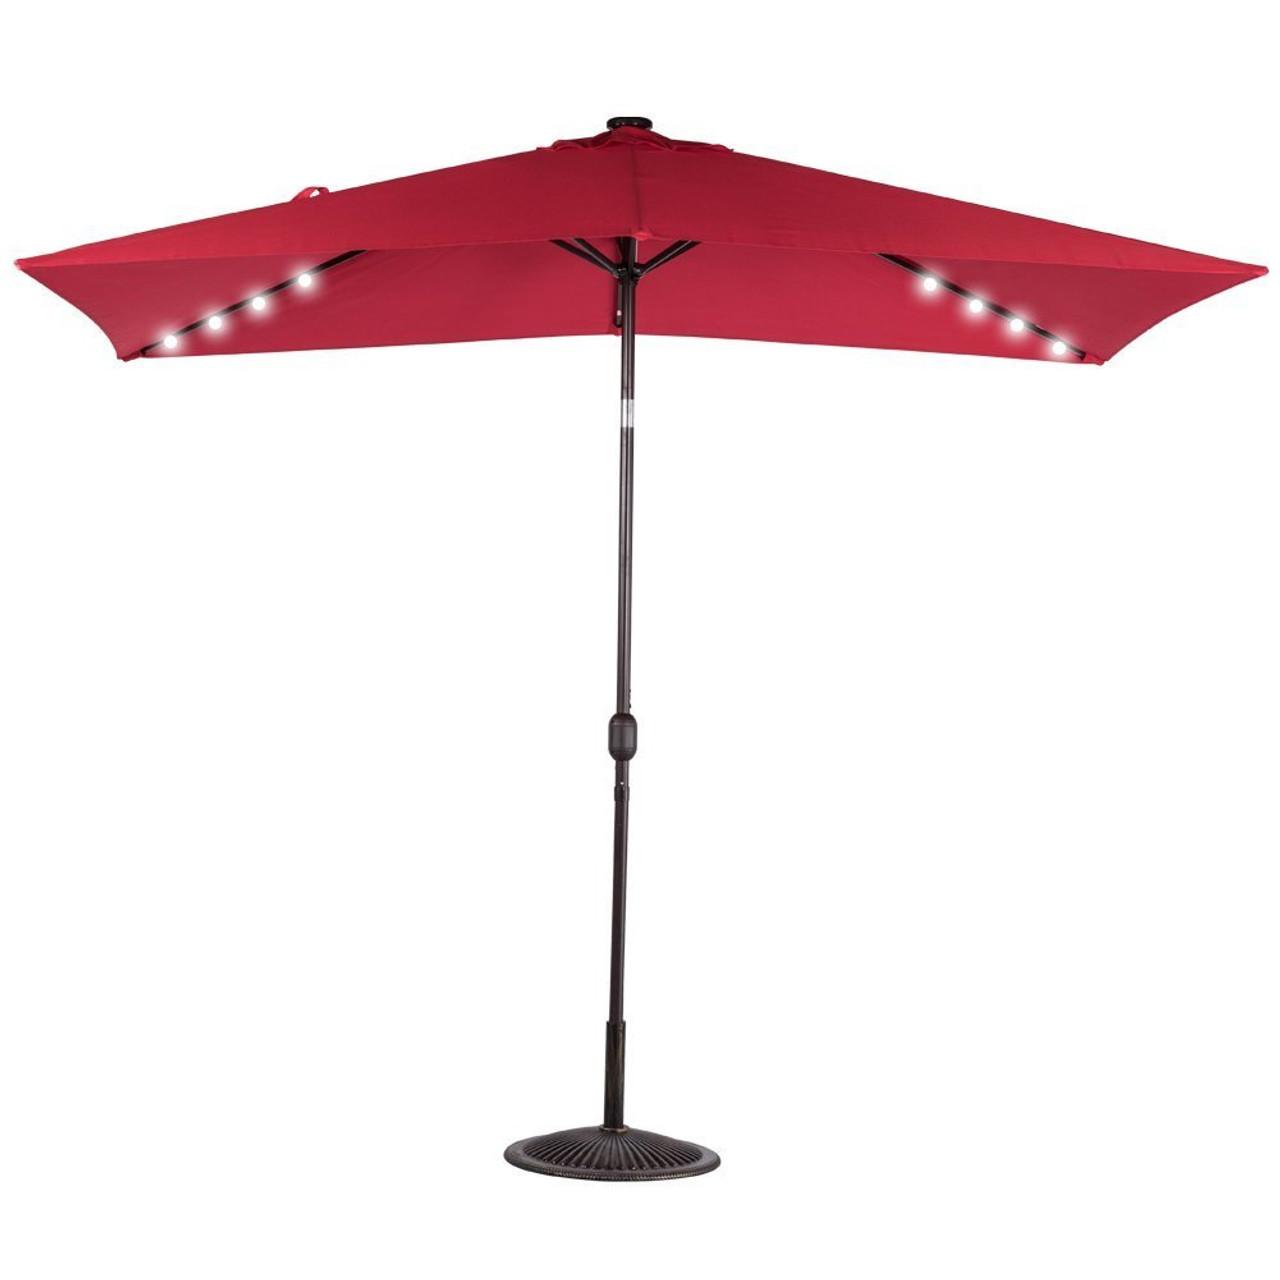 Rectangular Solar Powered 22 LED Lighted Outdoor Patio Umbrella(Red)